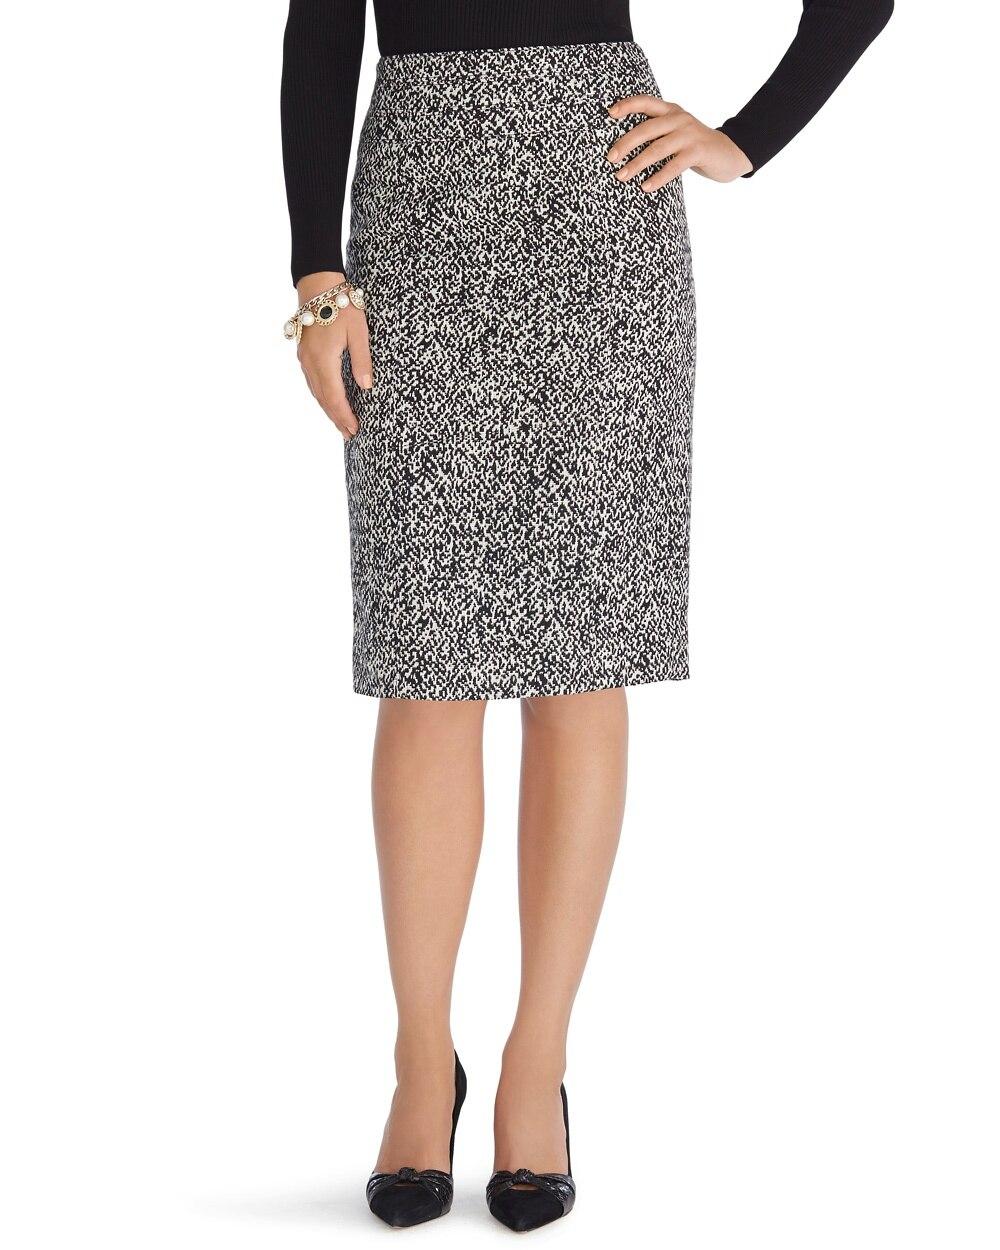 Menswear Tweed Pencil Skirt - WHBM